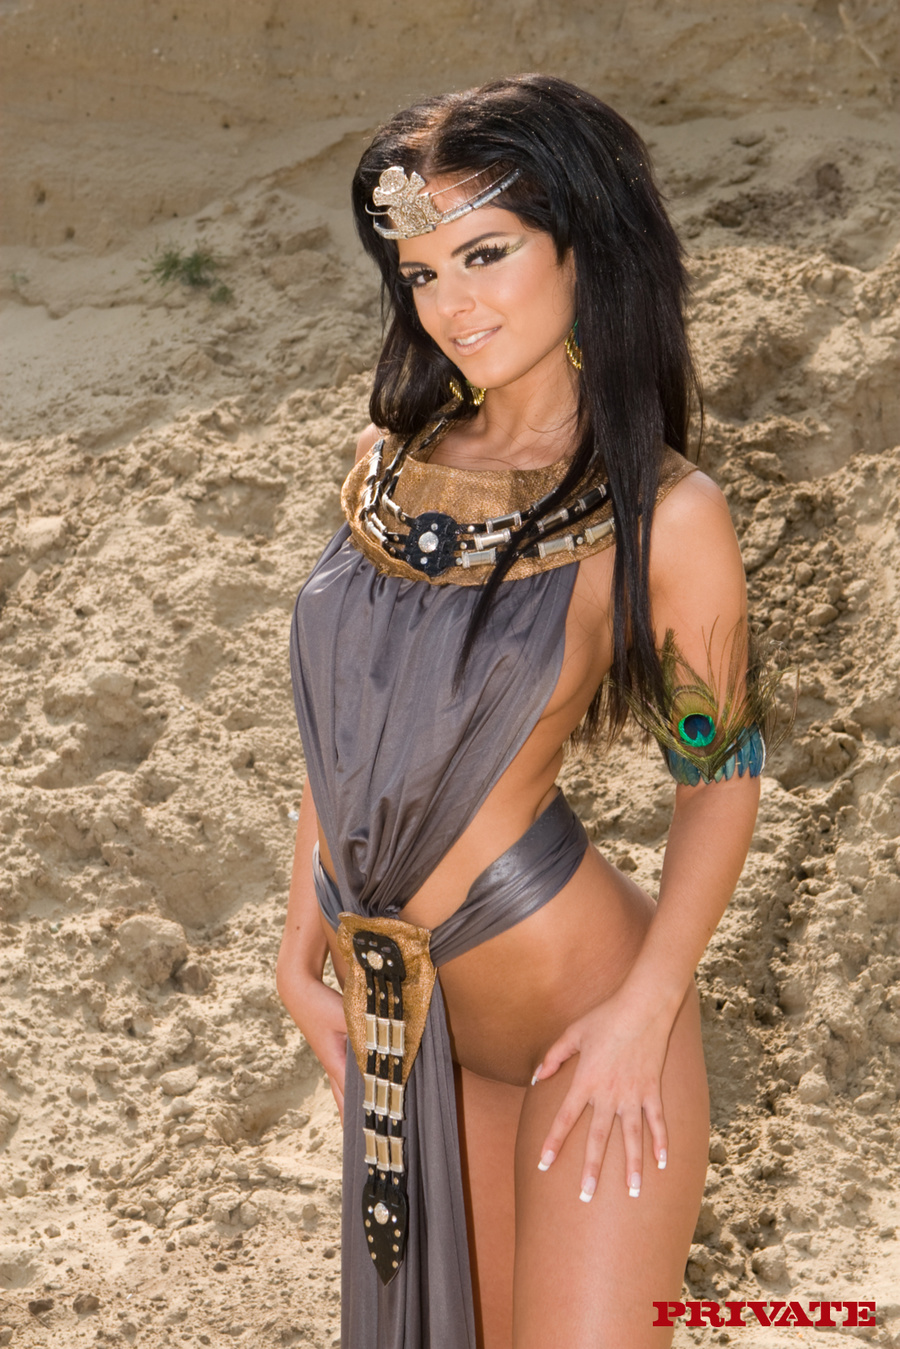 Jasmine jones naked